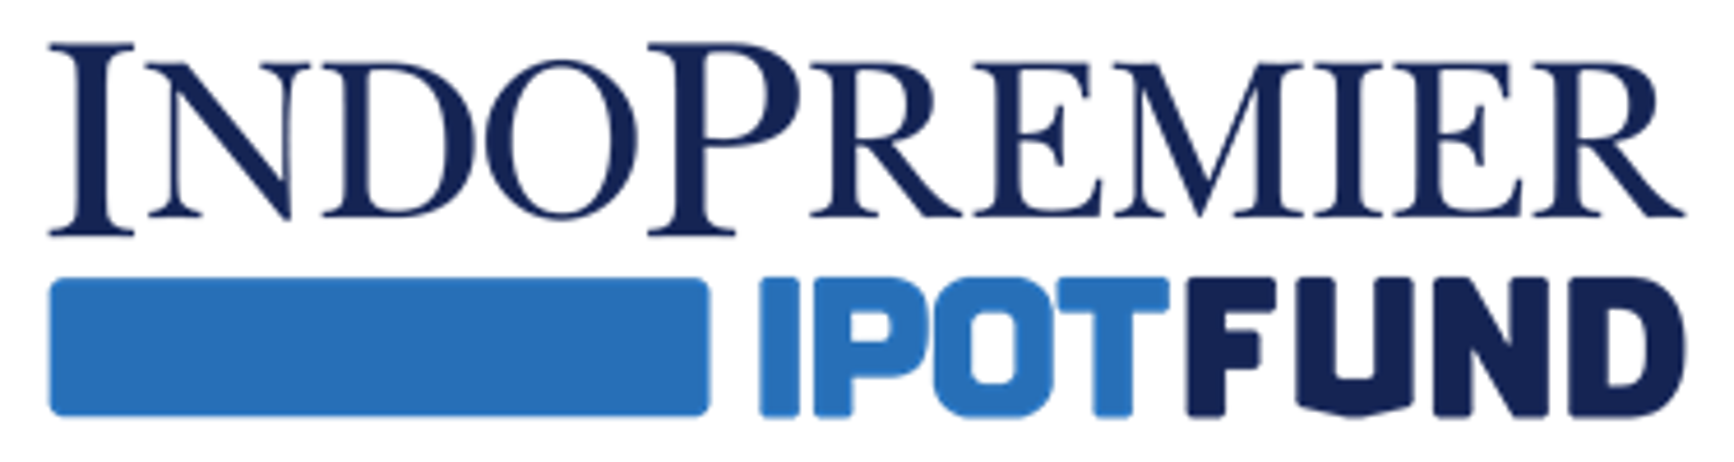 Indo Premier